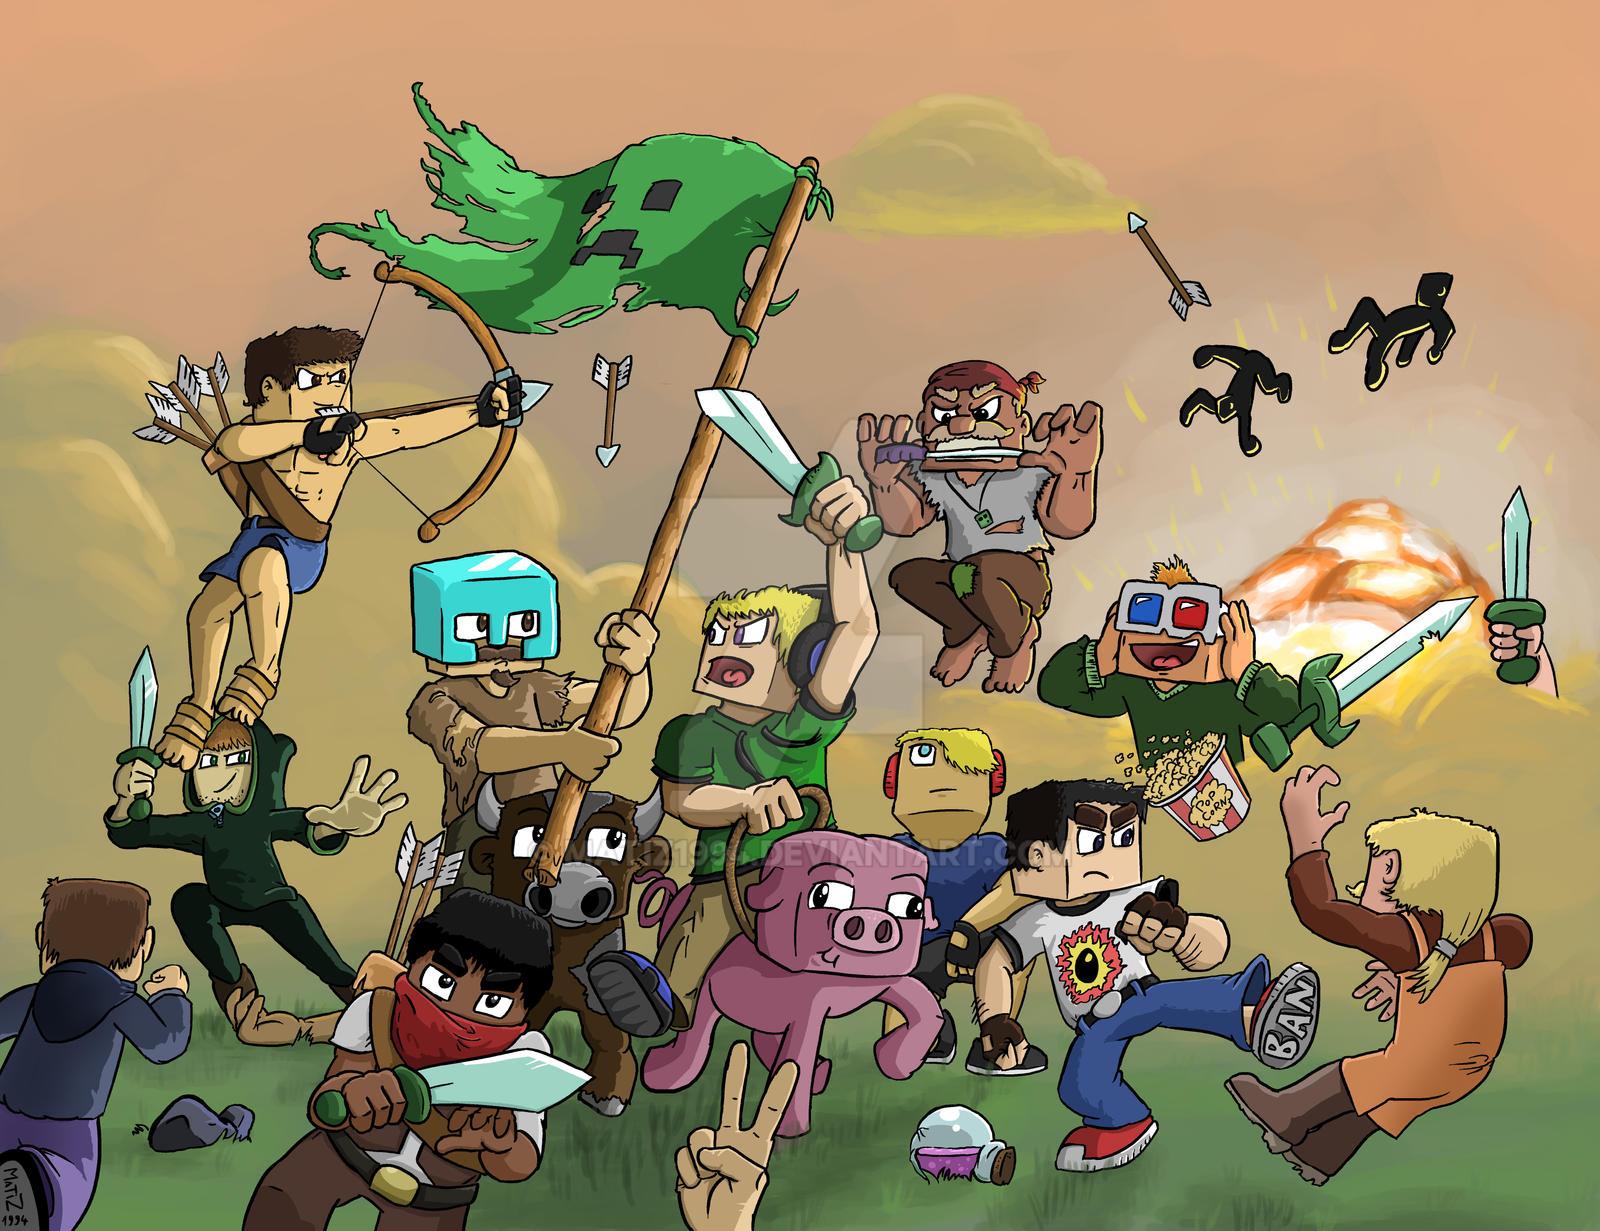 Skydoesminecraft Fan Art Tumblr Battle In Minecraft By Matiz Dlxn